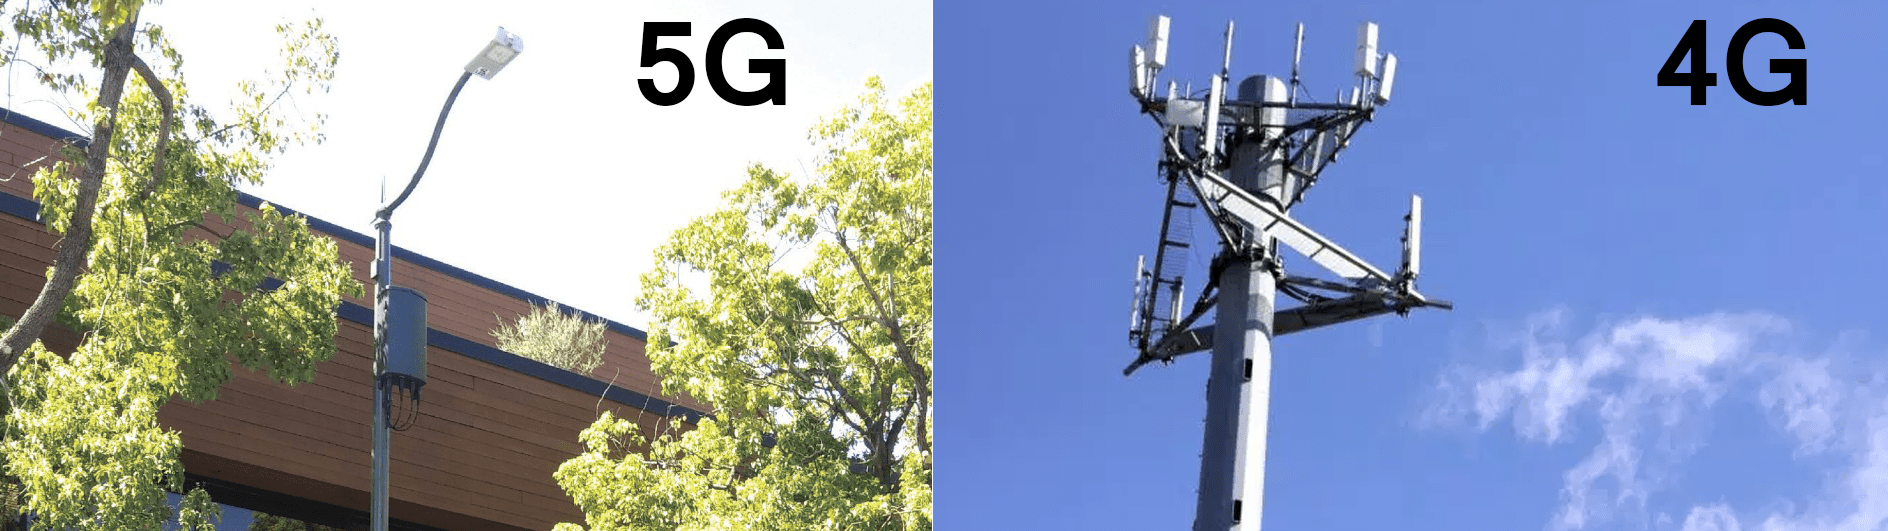 5G vs 4G cell tower